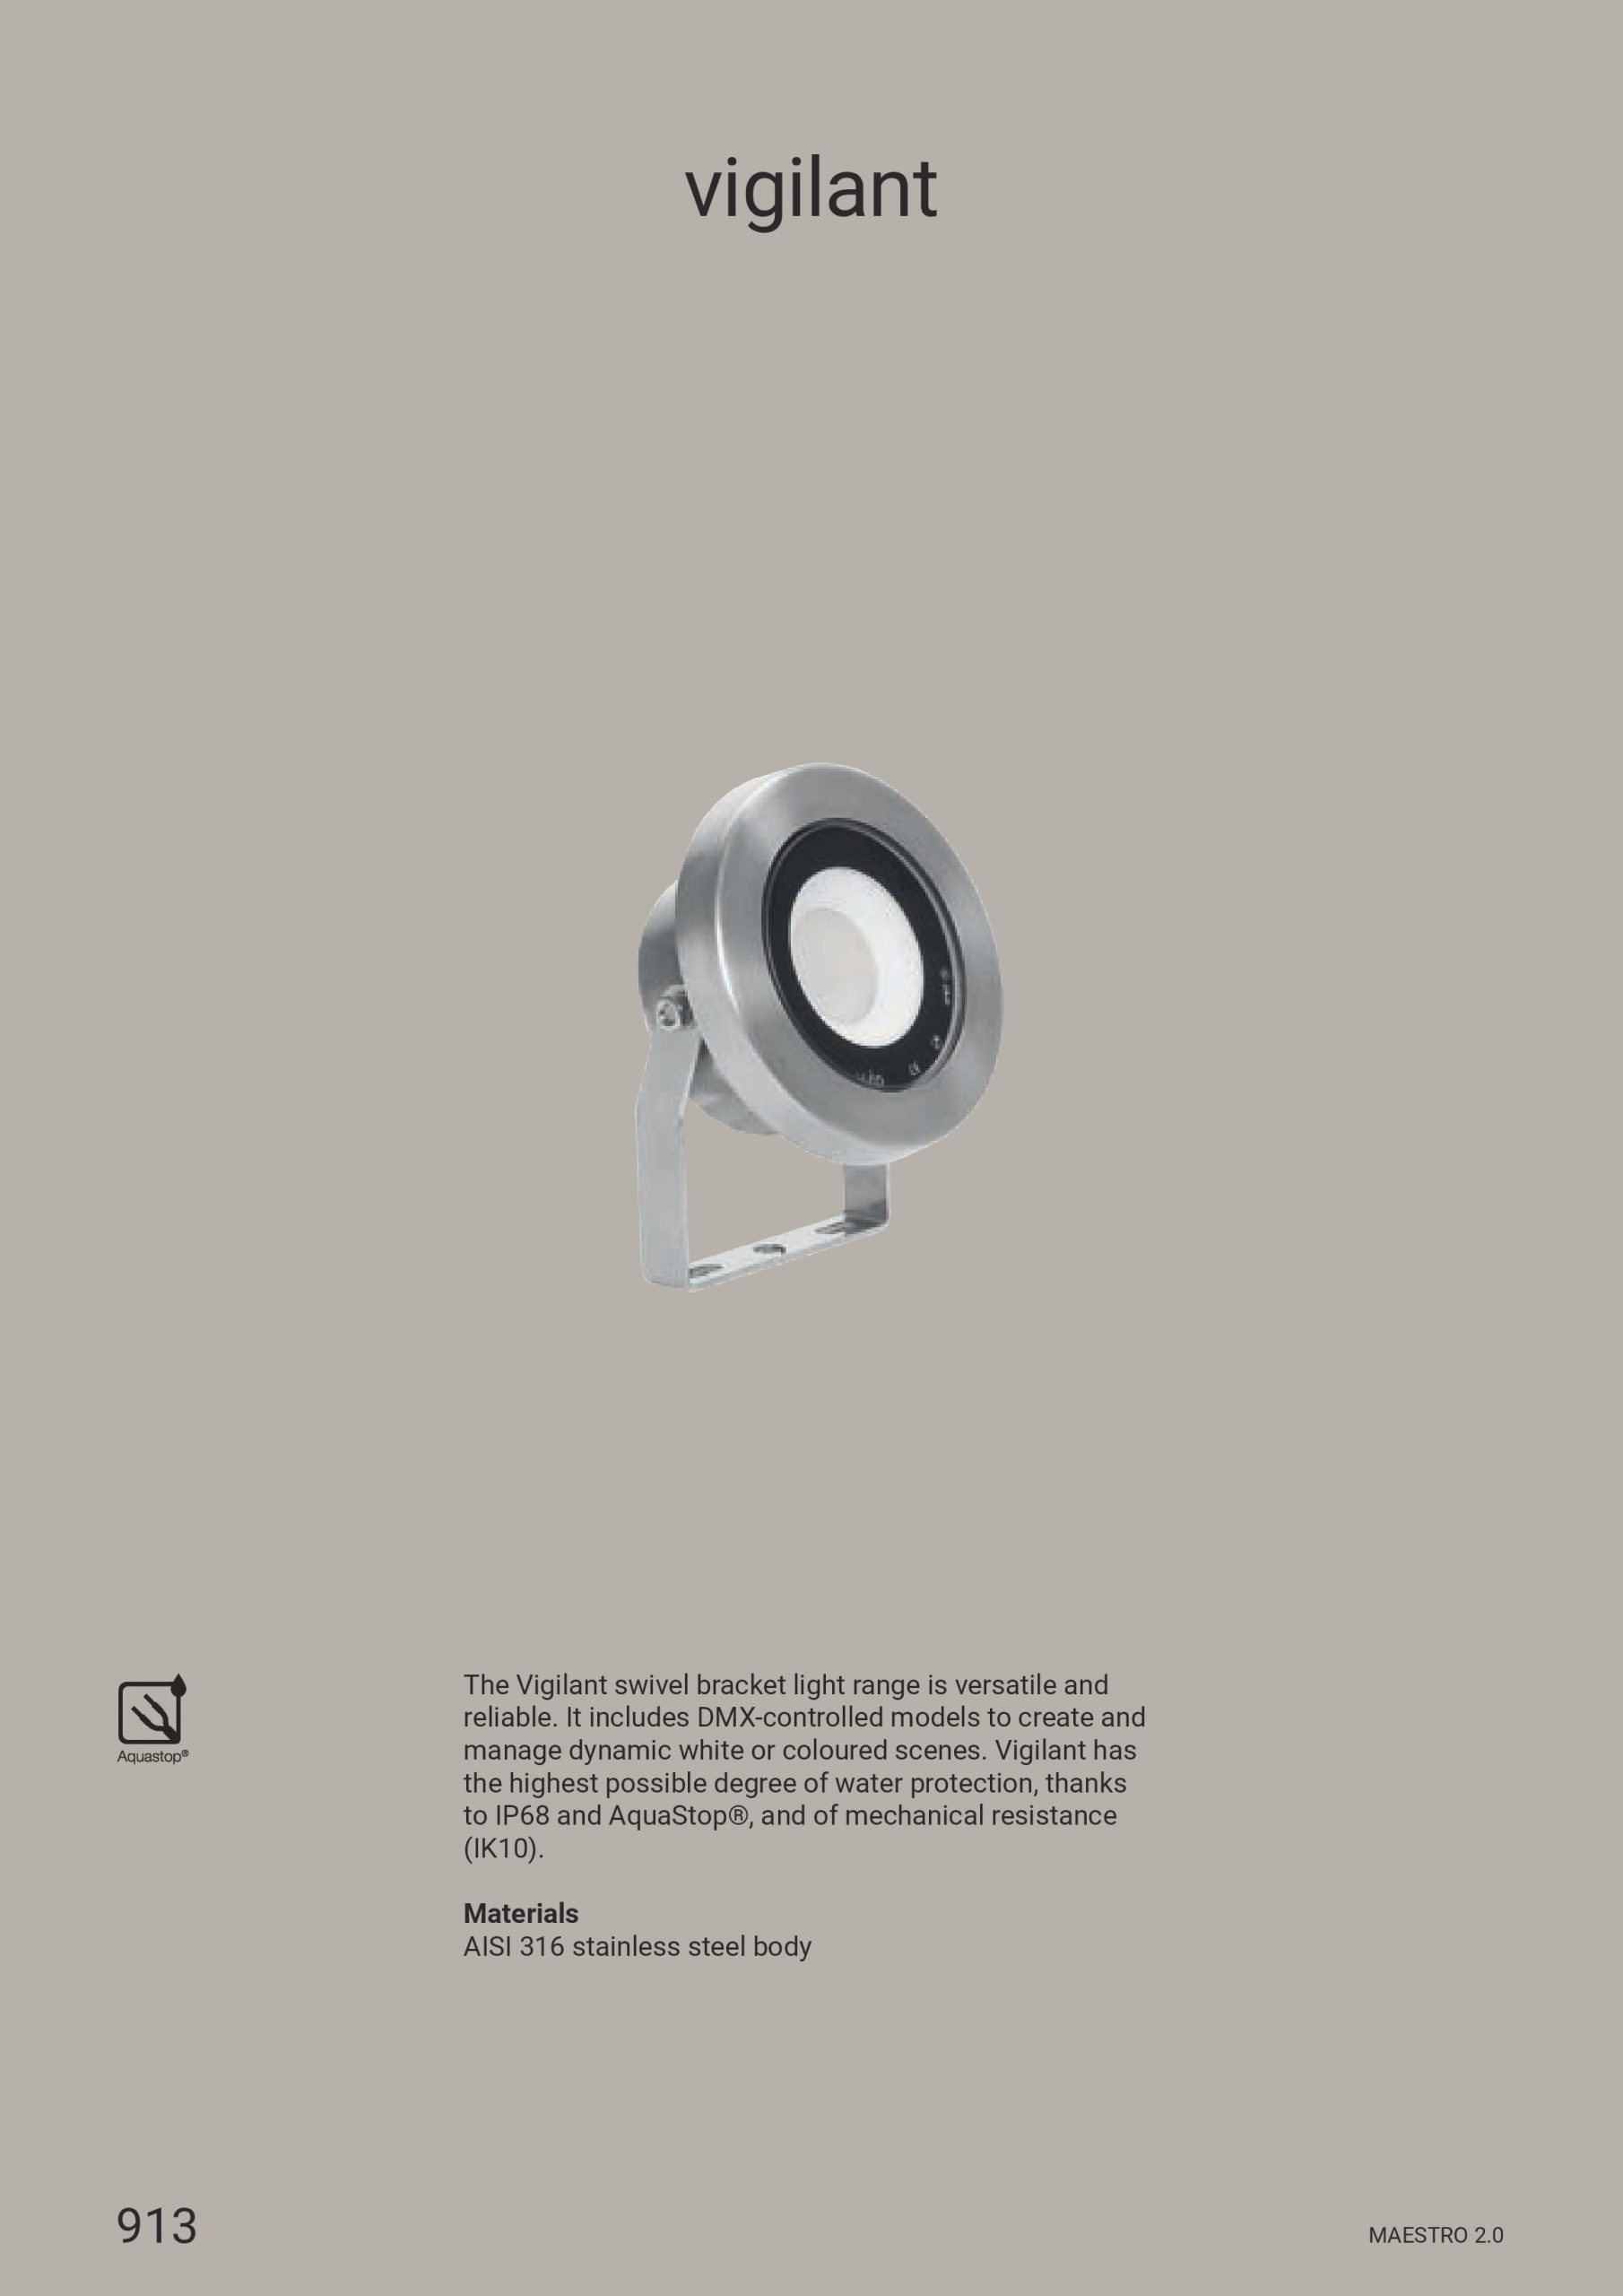 Linea Light – Vigilant